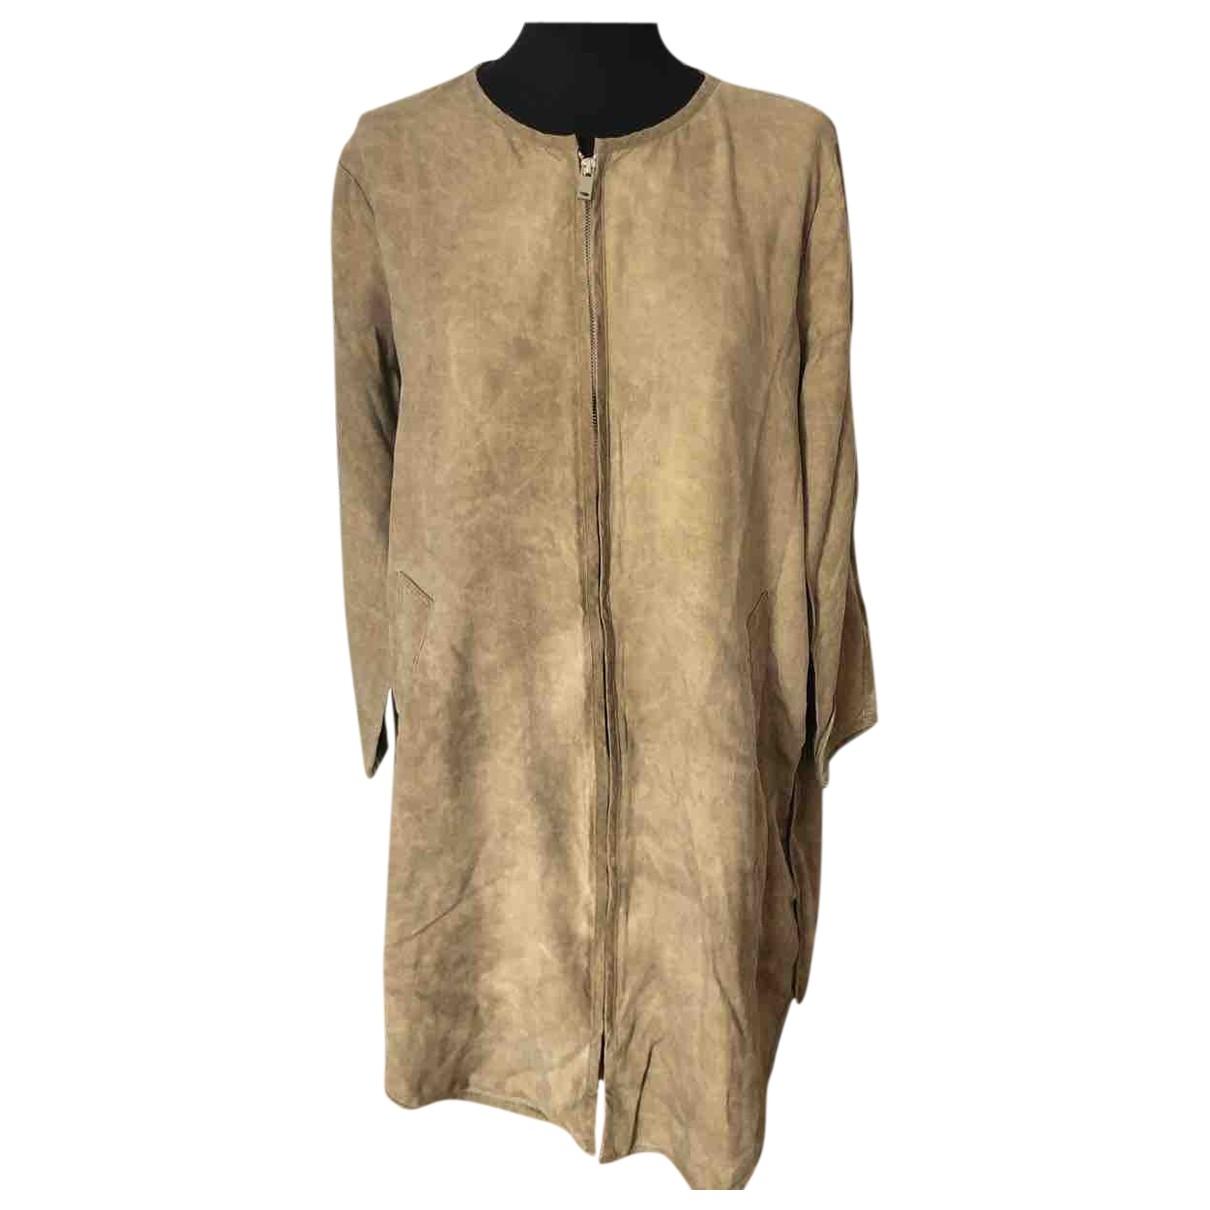 Zara \N Camel Linen dress for Women S International